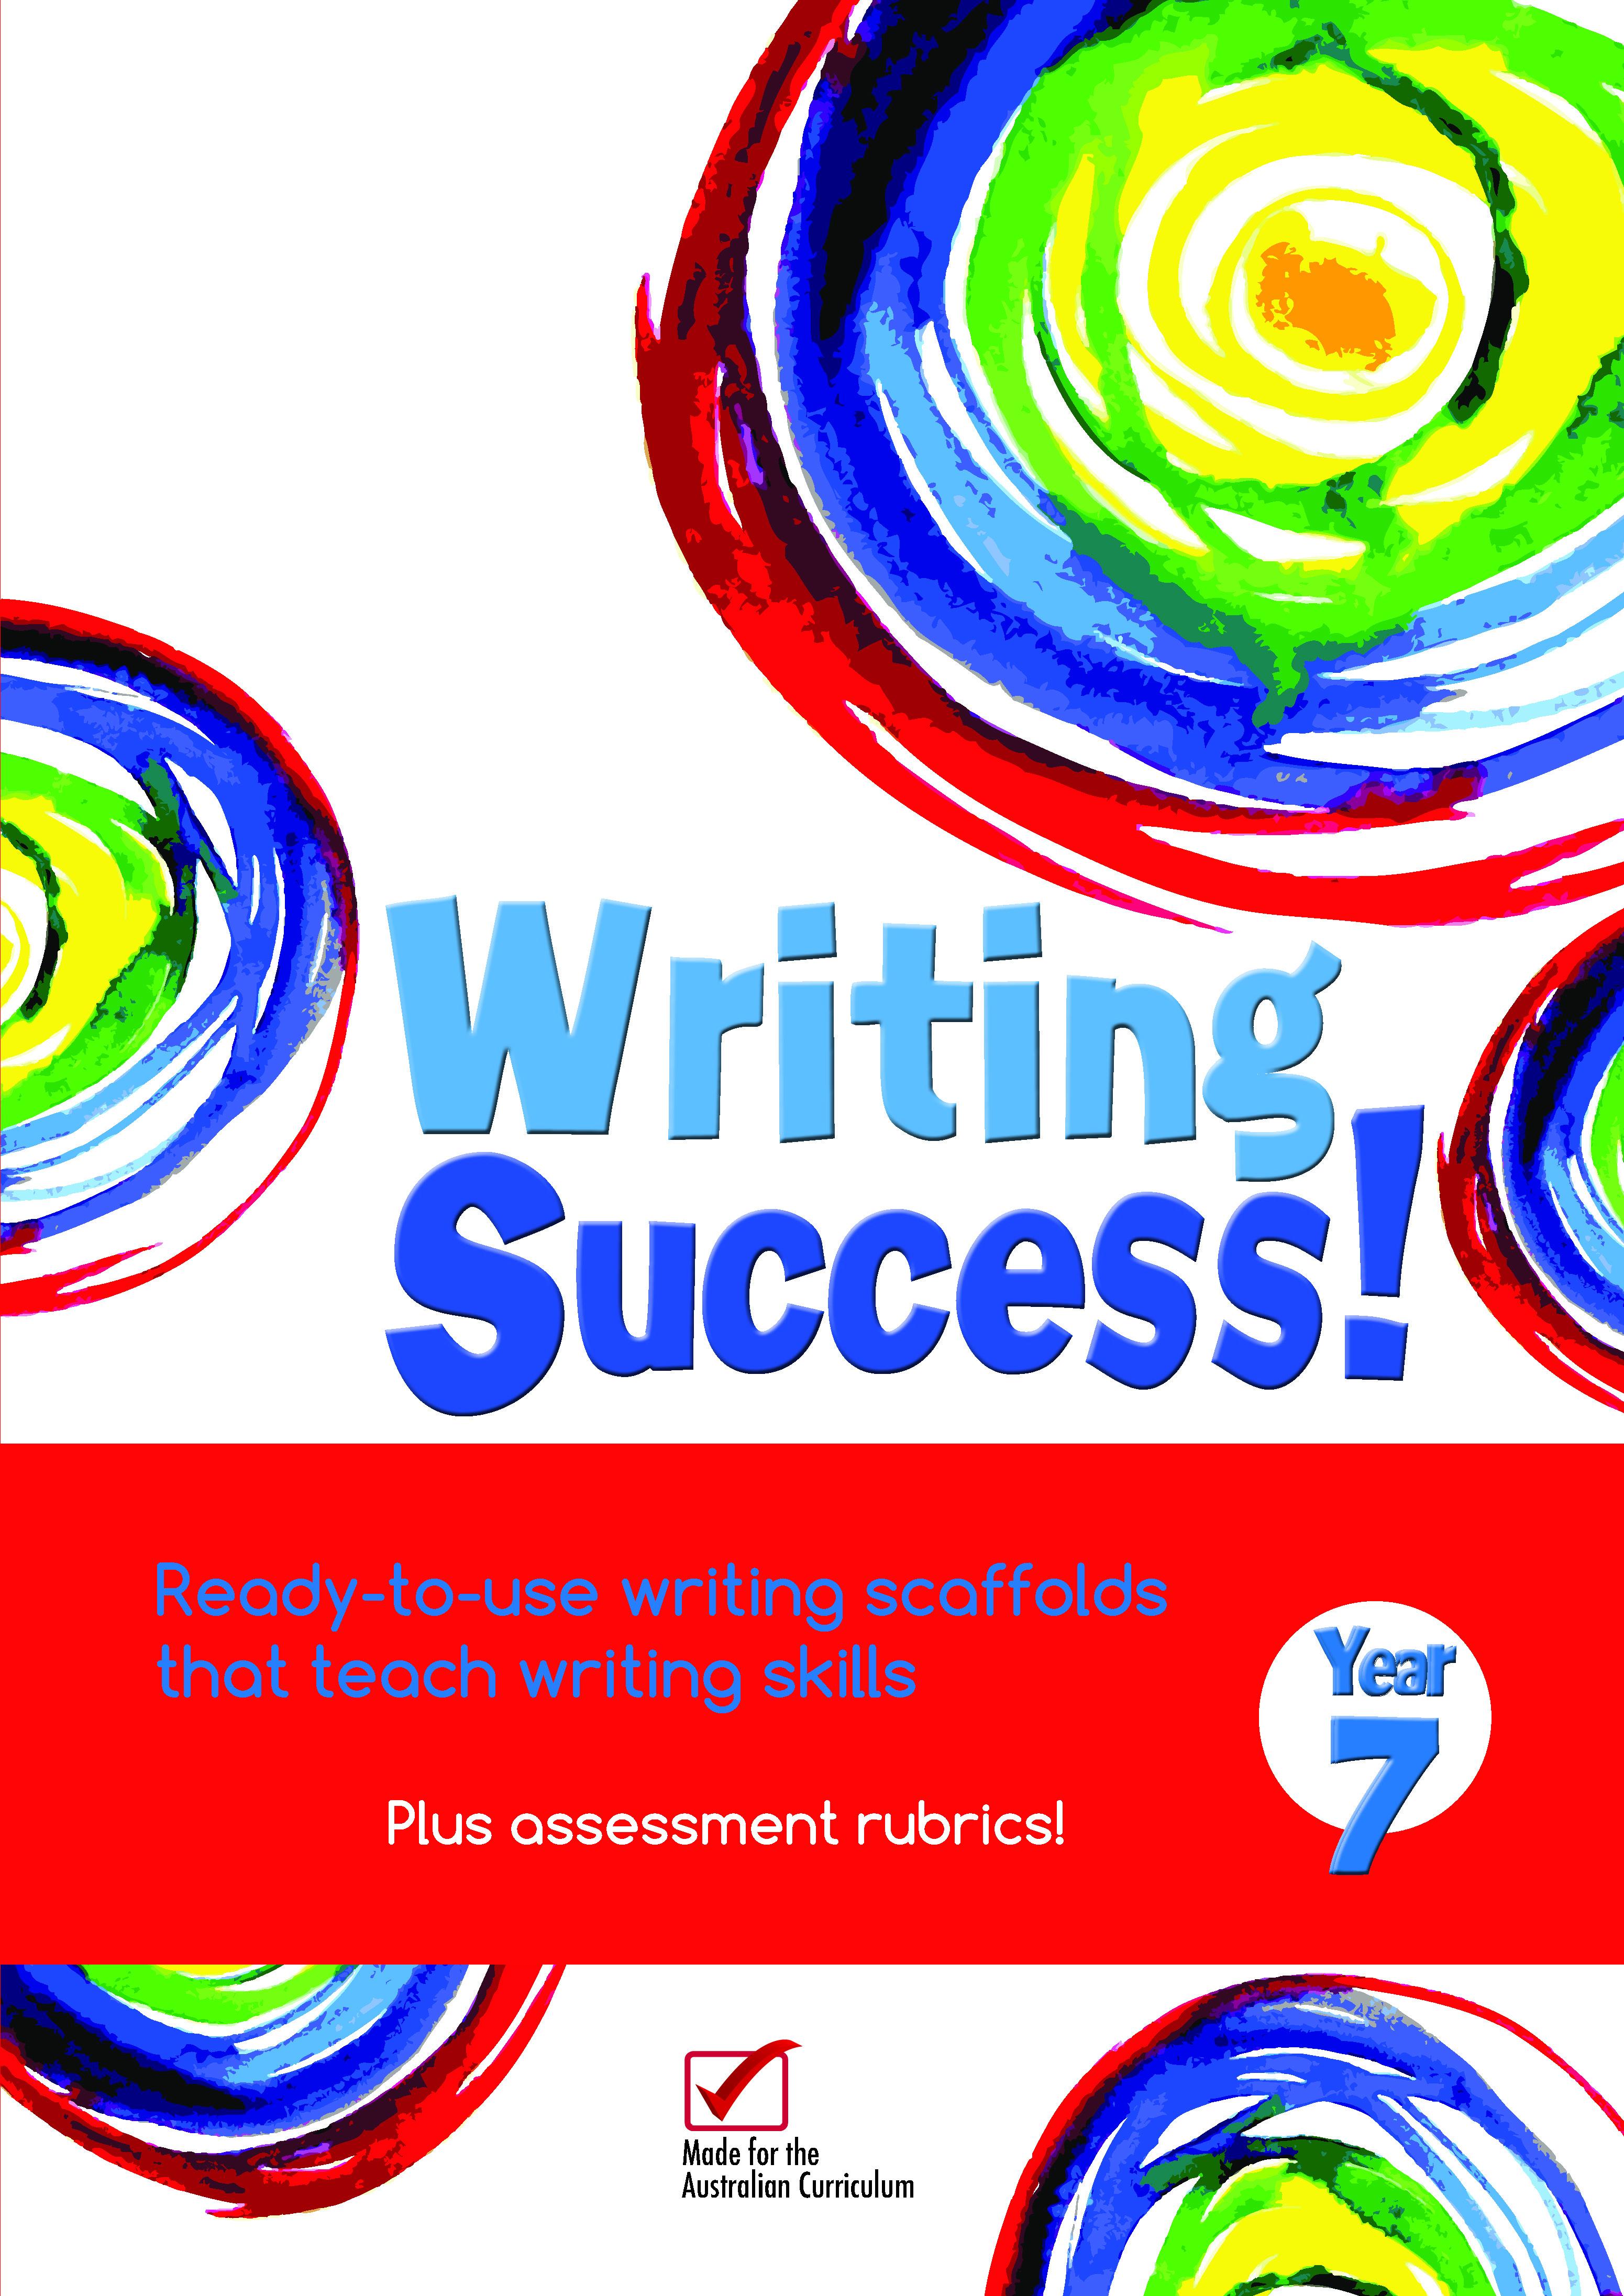 Writing Success! Year 7